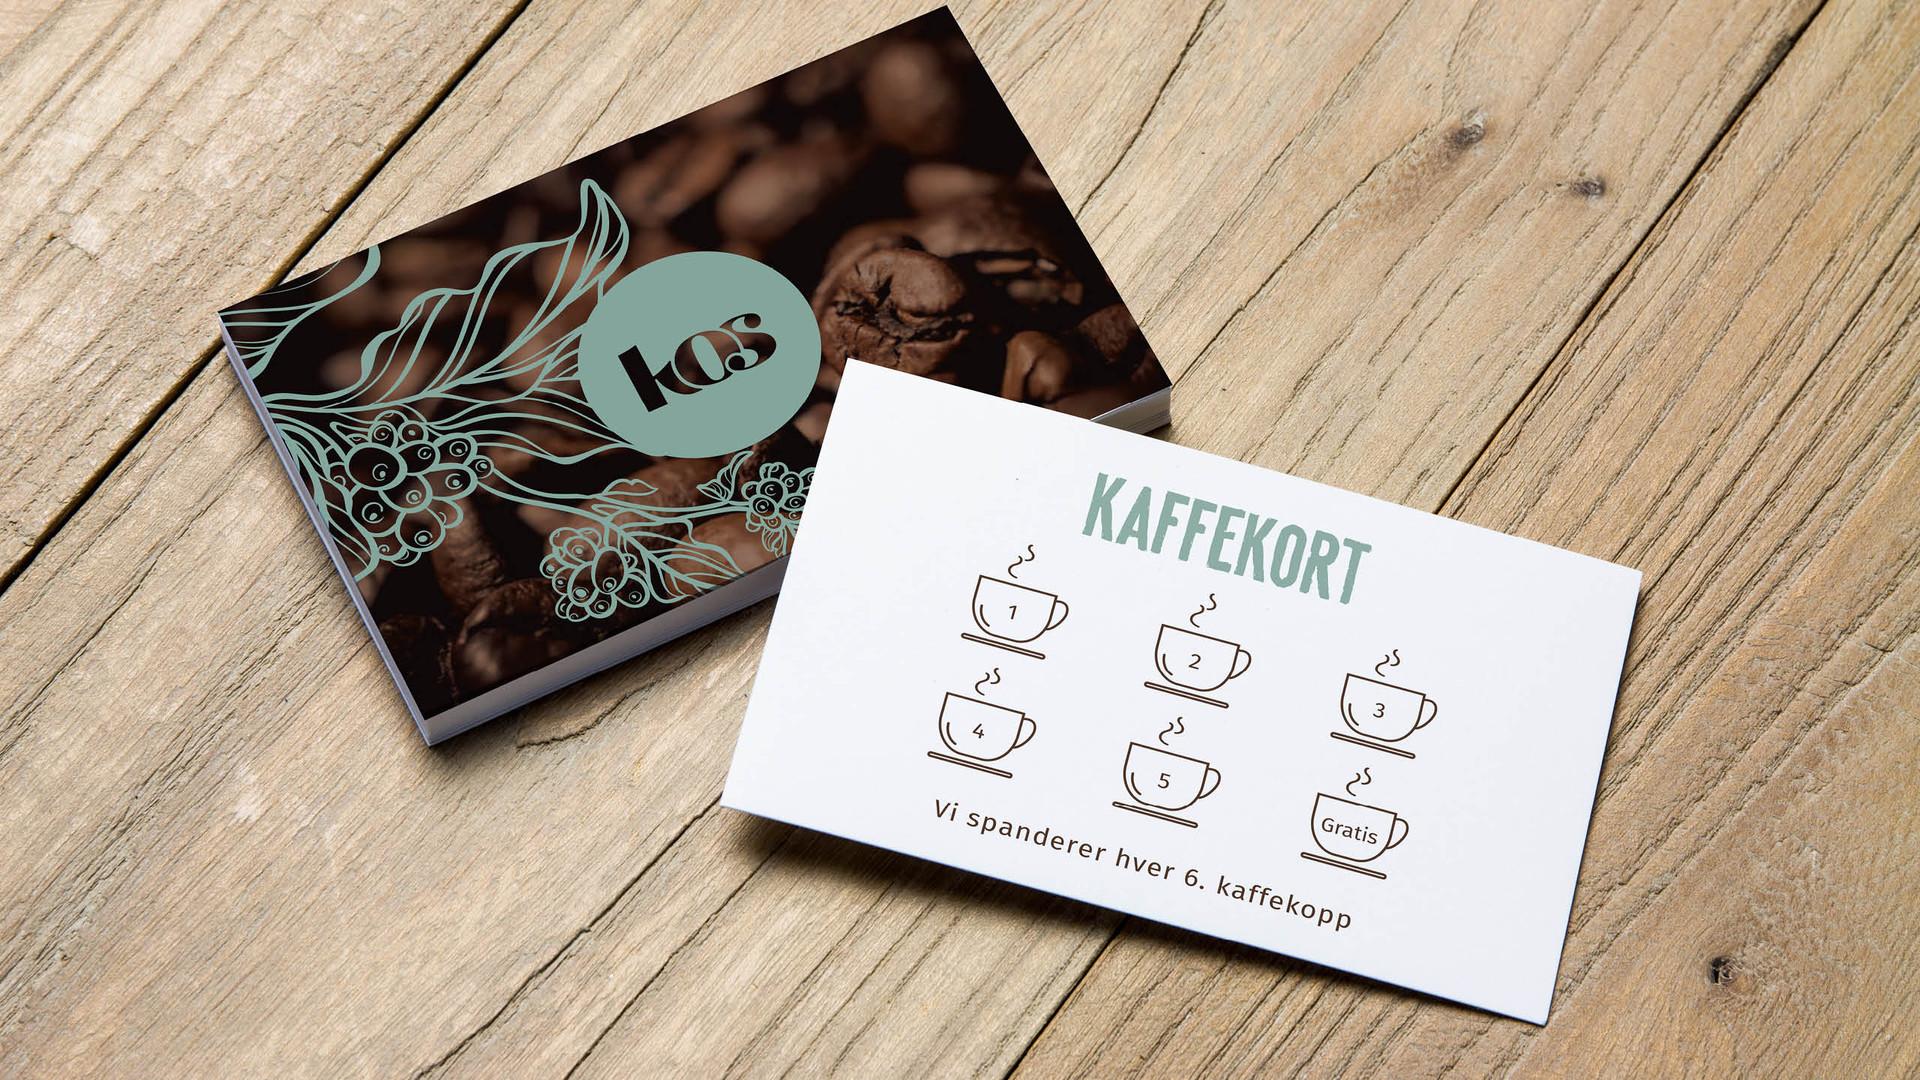 Kaffekort